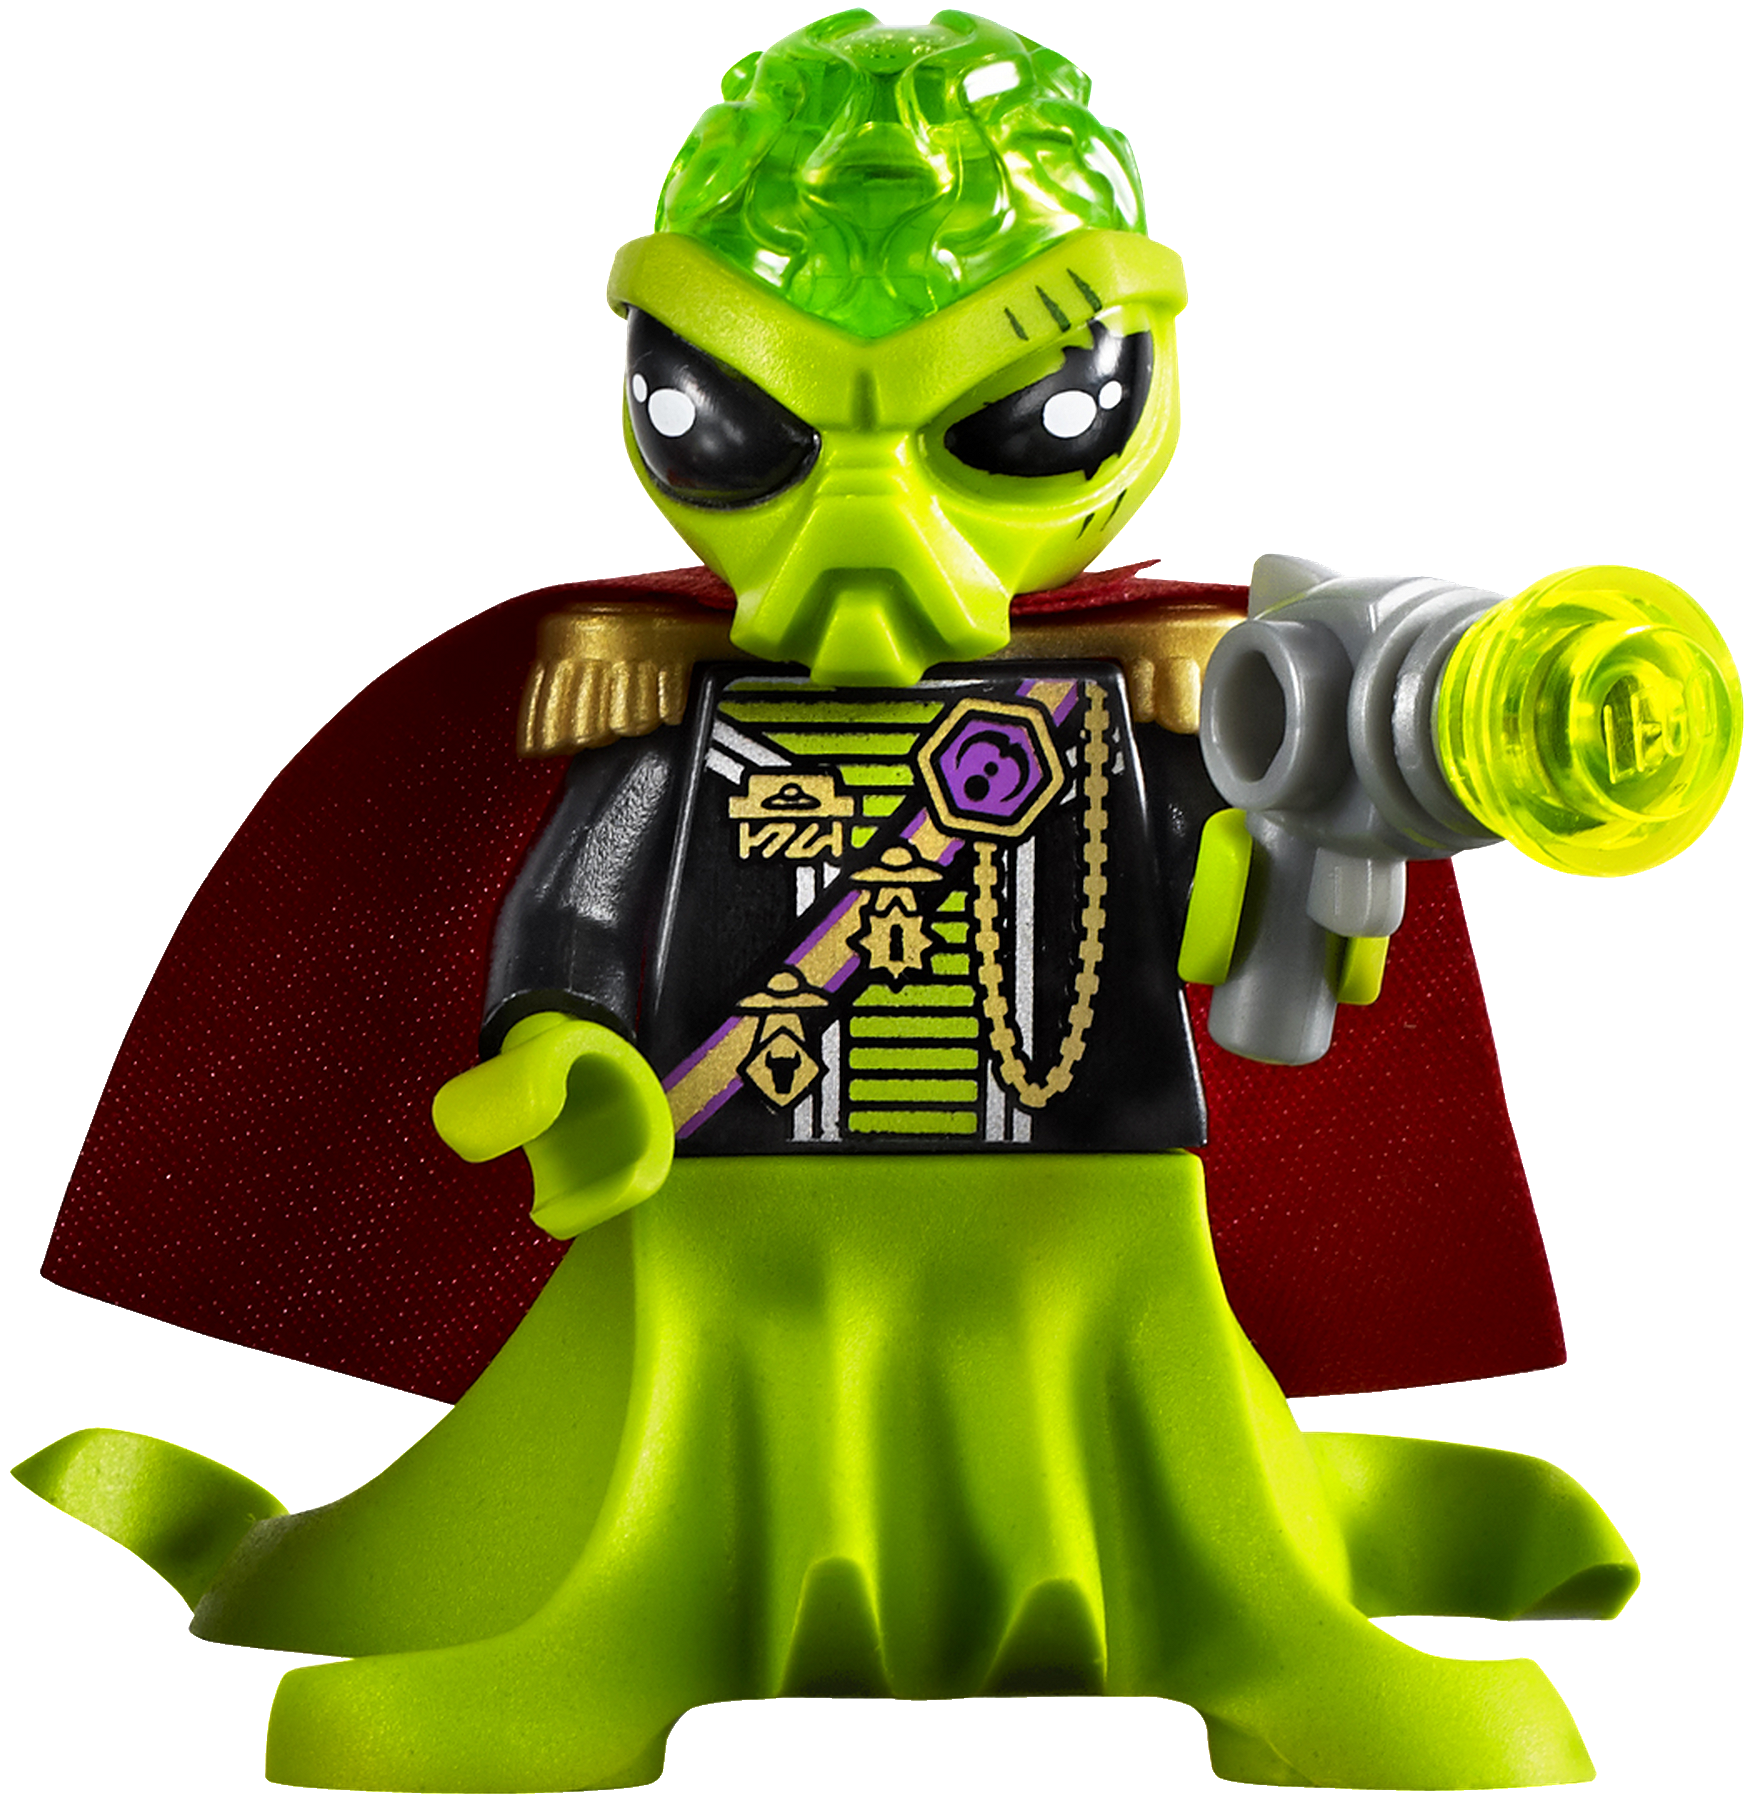 LEGO Alien Conquest Sets: 7051 Tripod Invader NEW |Lego Alien Invasion